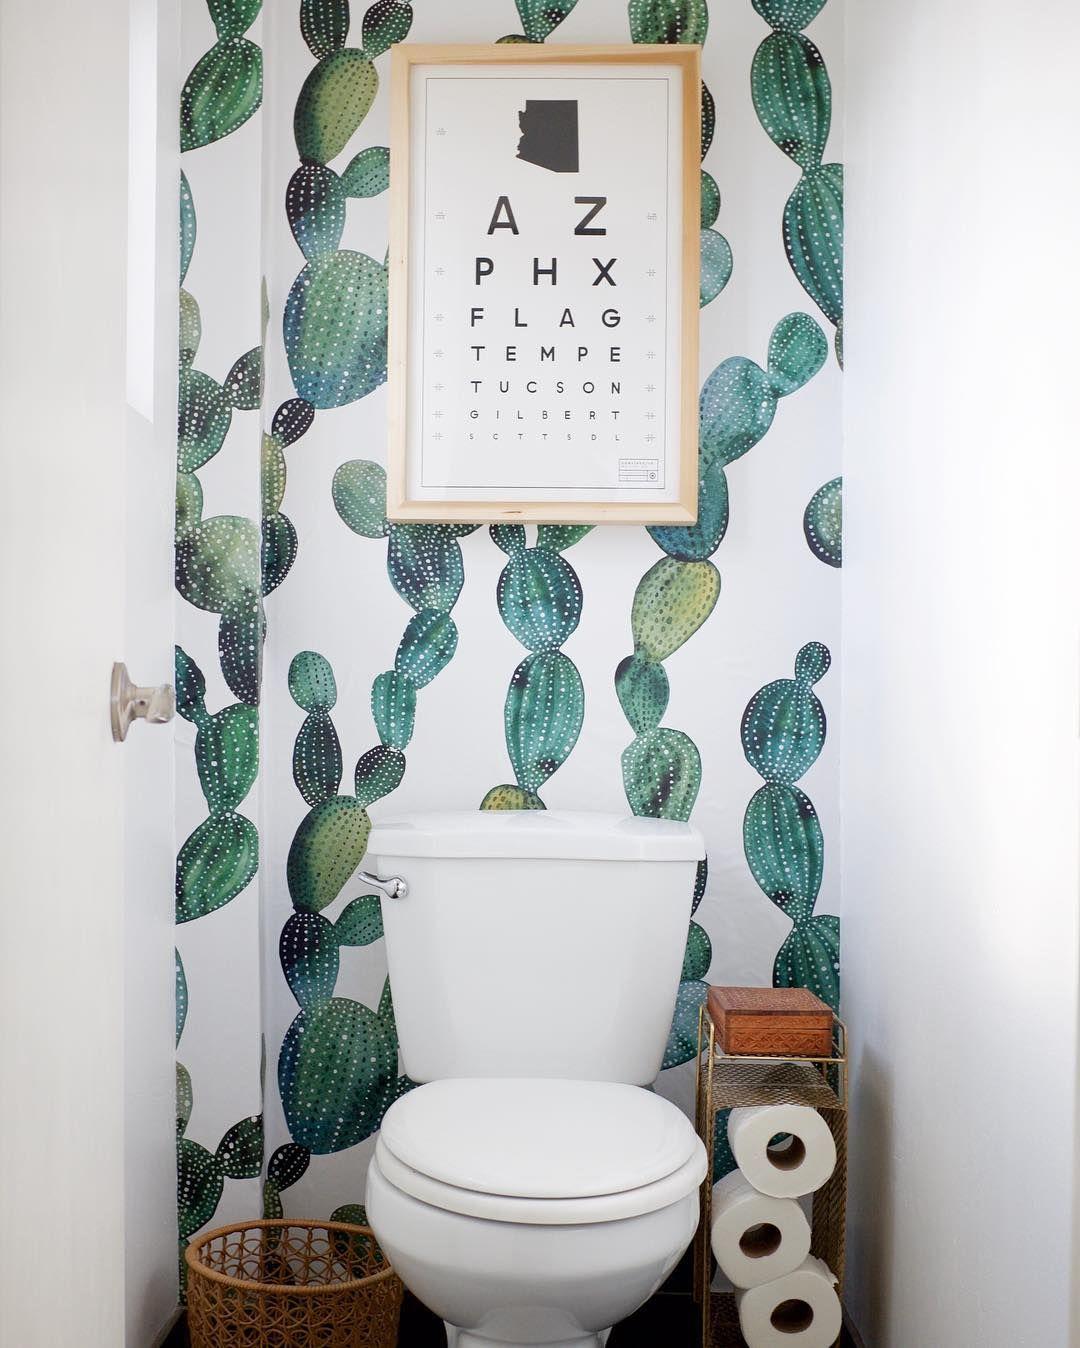 Pin By Coloray Decor On H O M E Removable Wallpaper Bathroom Bathroom Decor Boho Bathroom